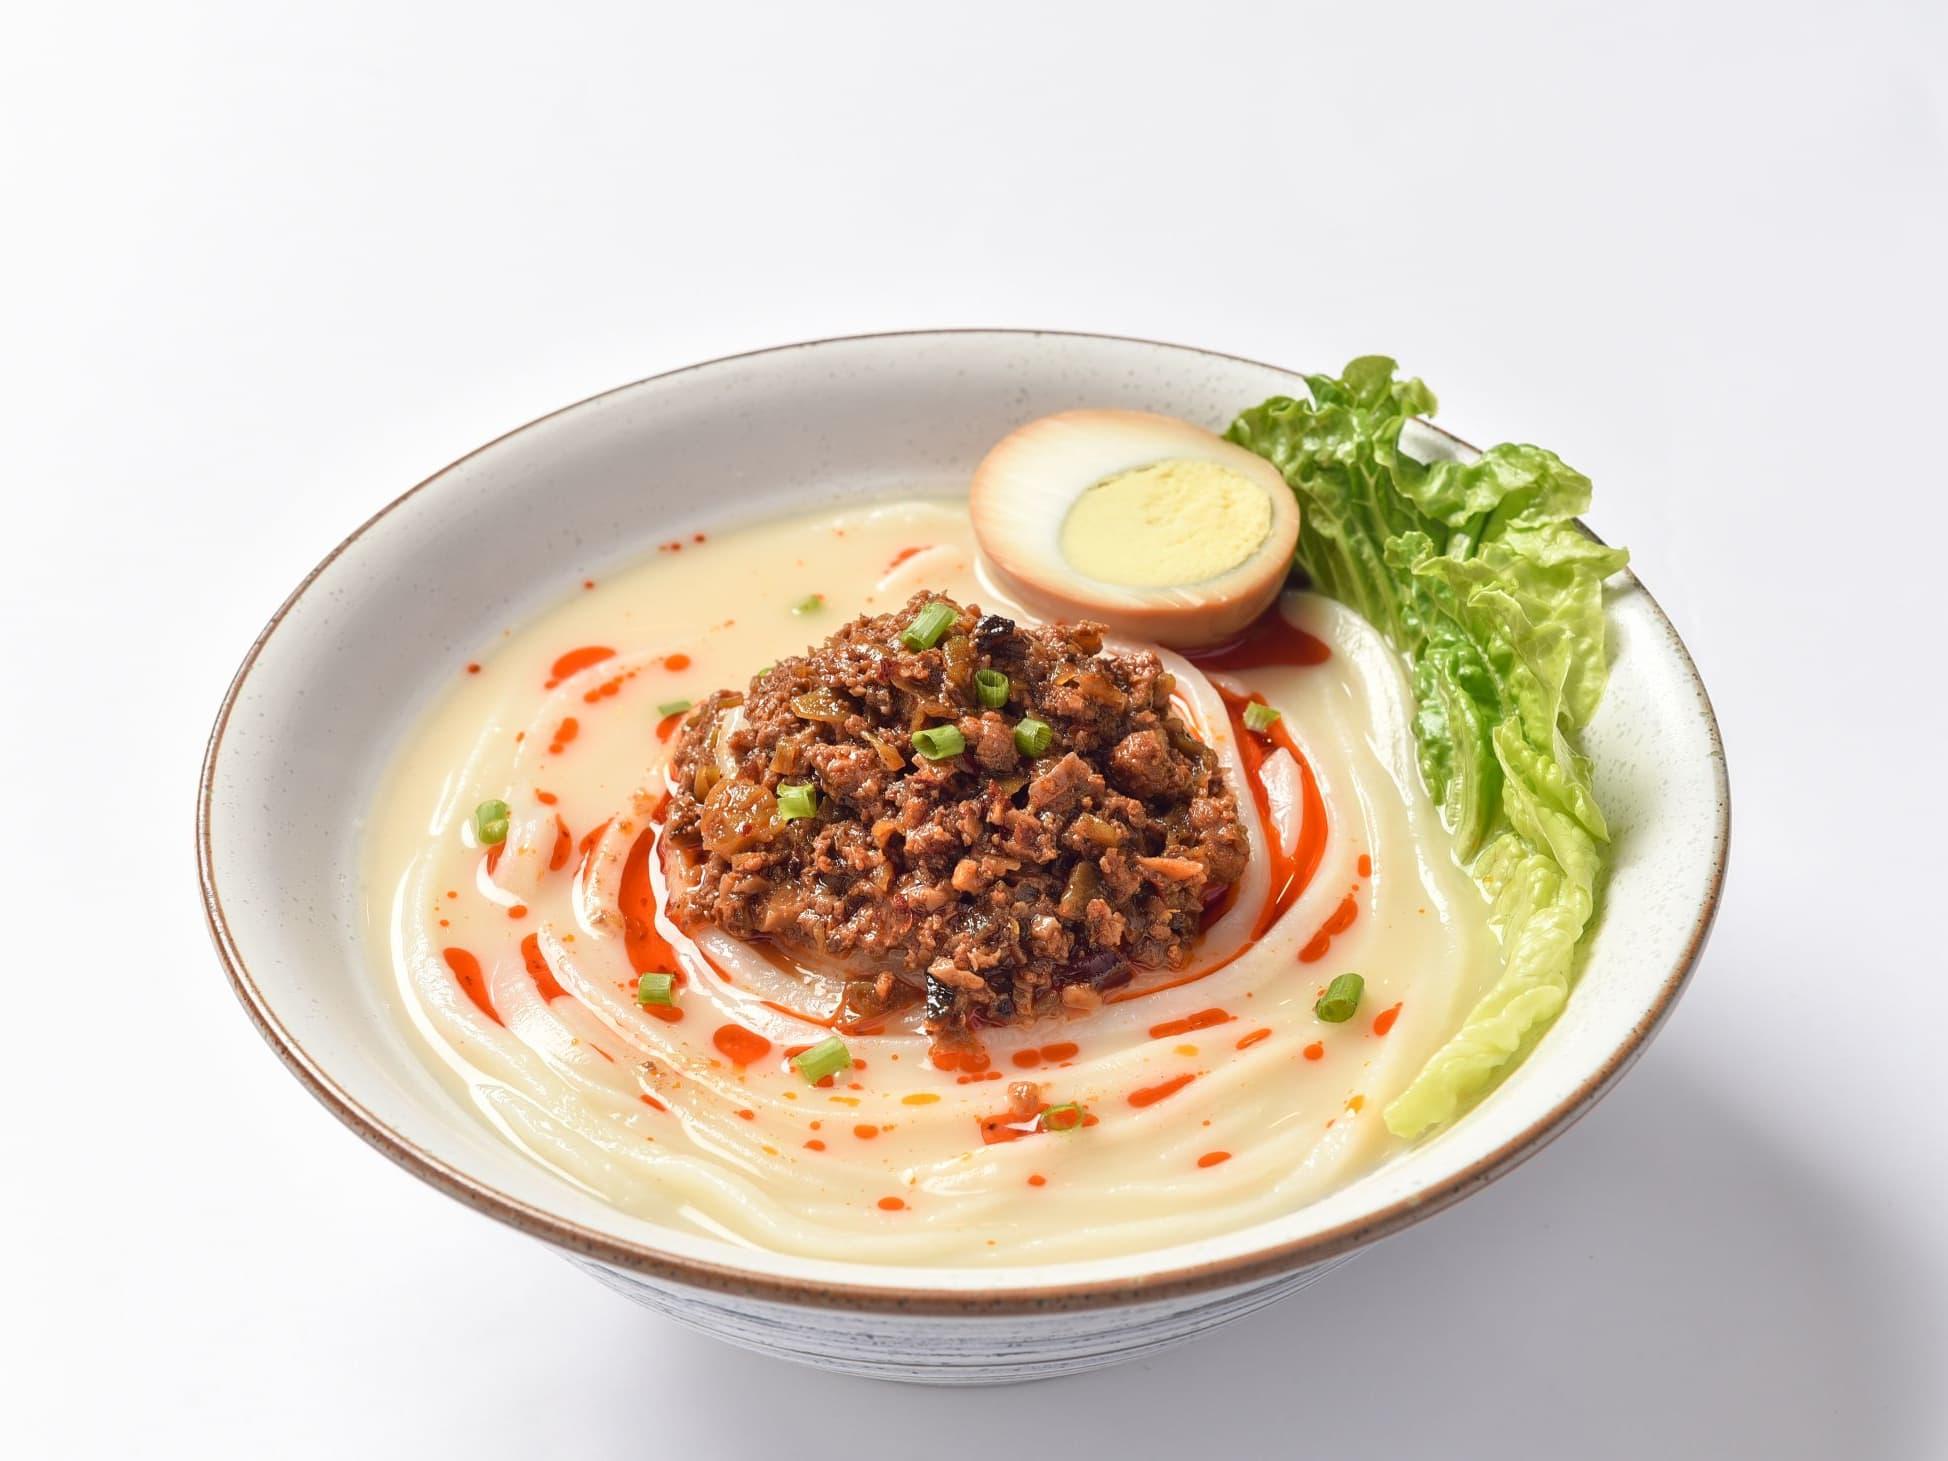 1 x Spicy Pork Udon + Ebi Tempura + Barley Drink [Exclusive Deal]